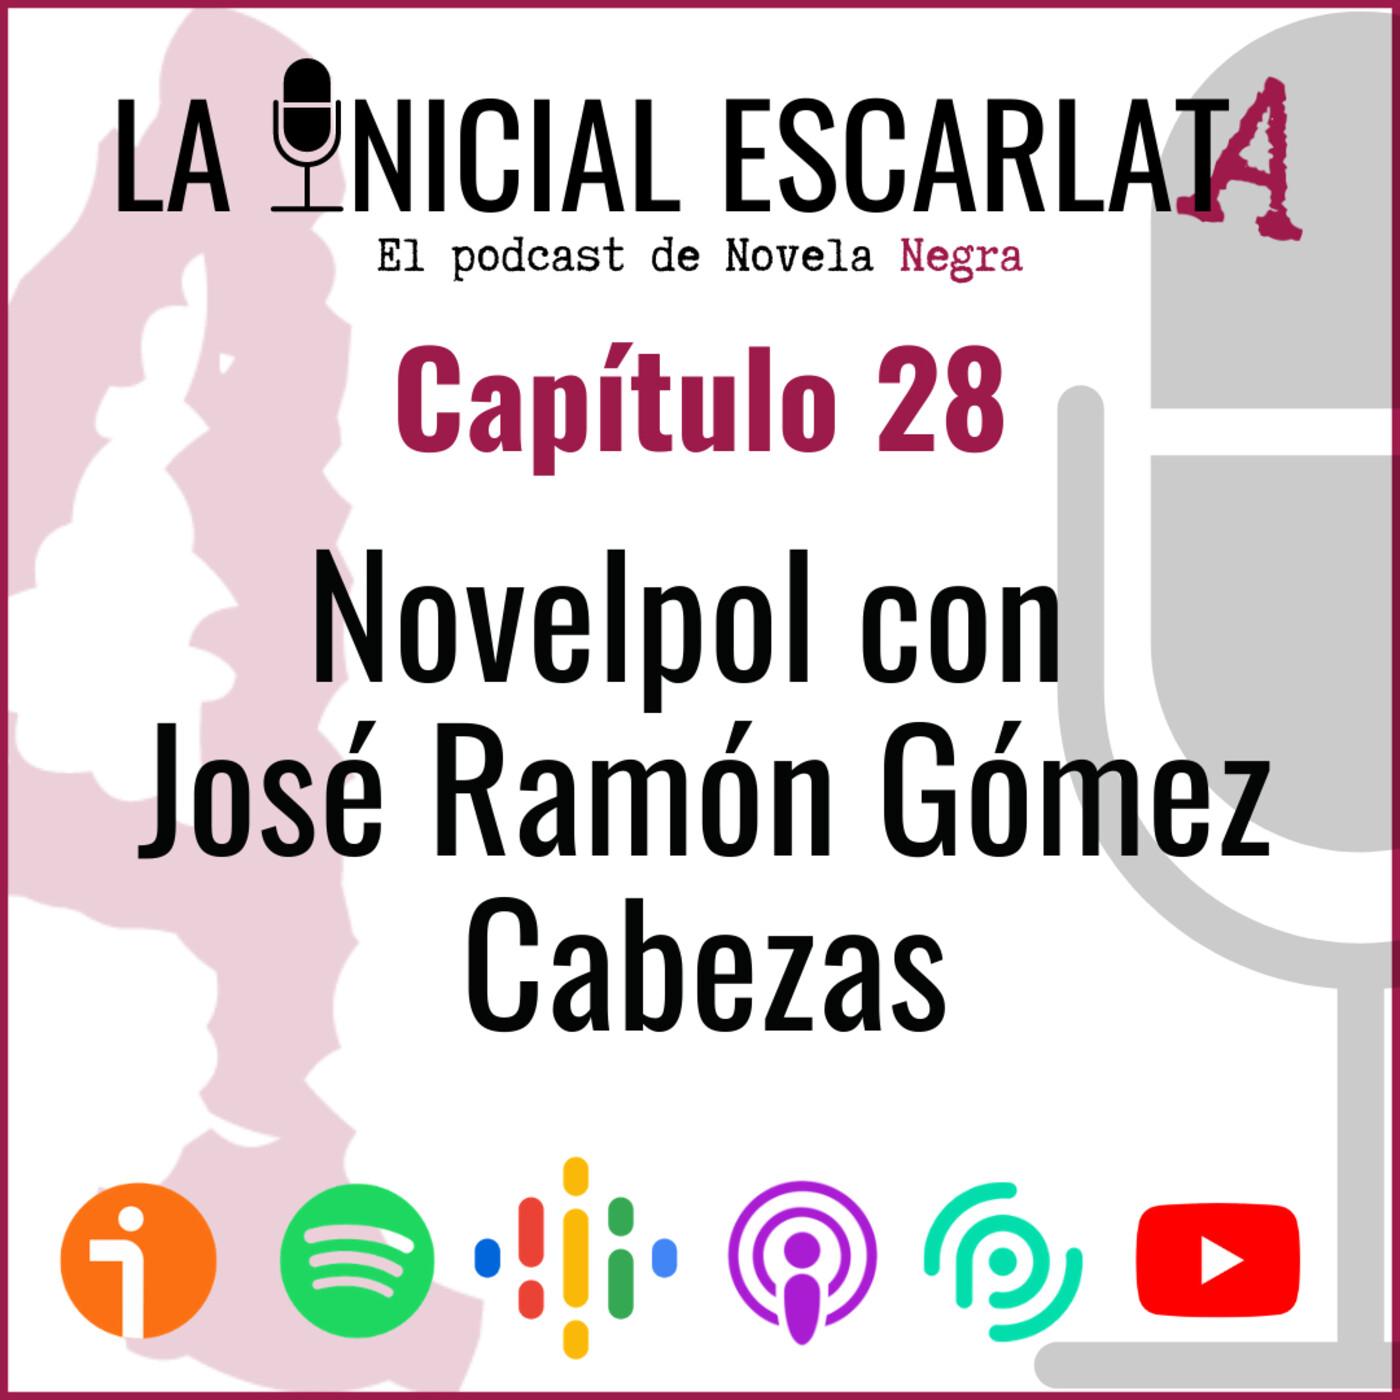 Capítulo 28: Novelpol con José Ramón Gómez Cabezas (@JoserraGomezCab)